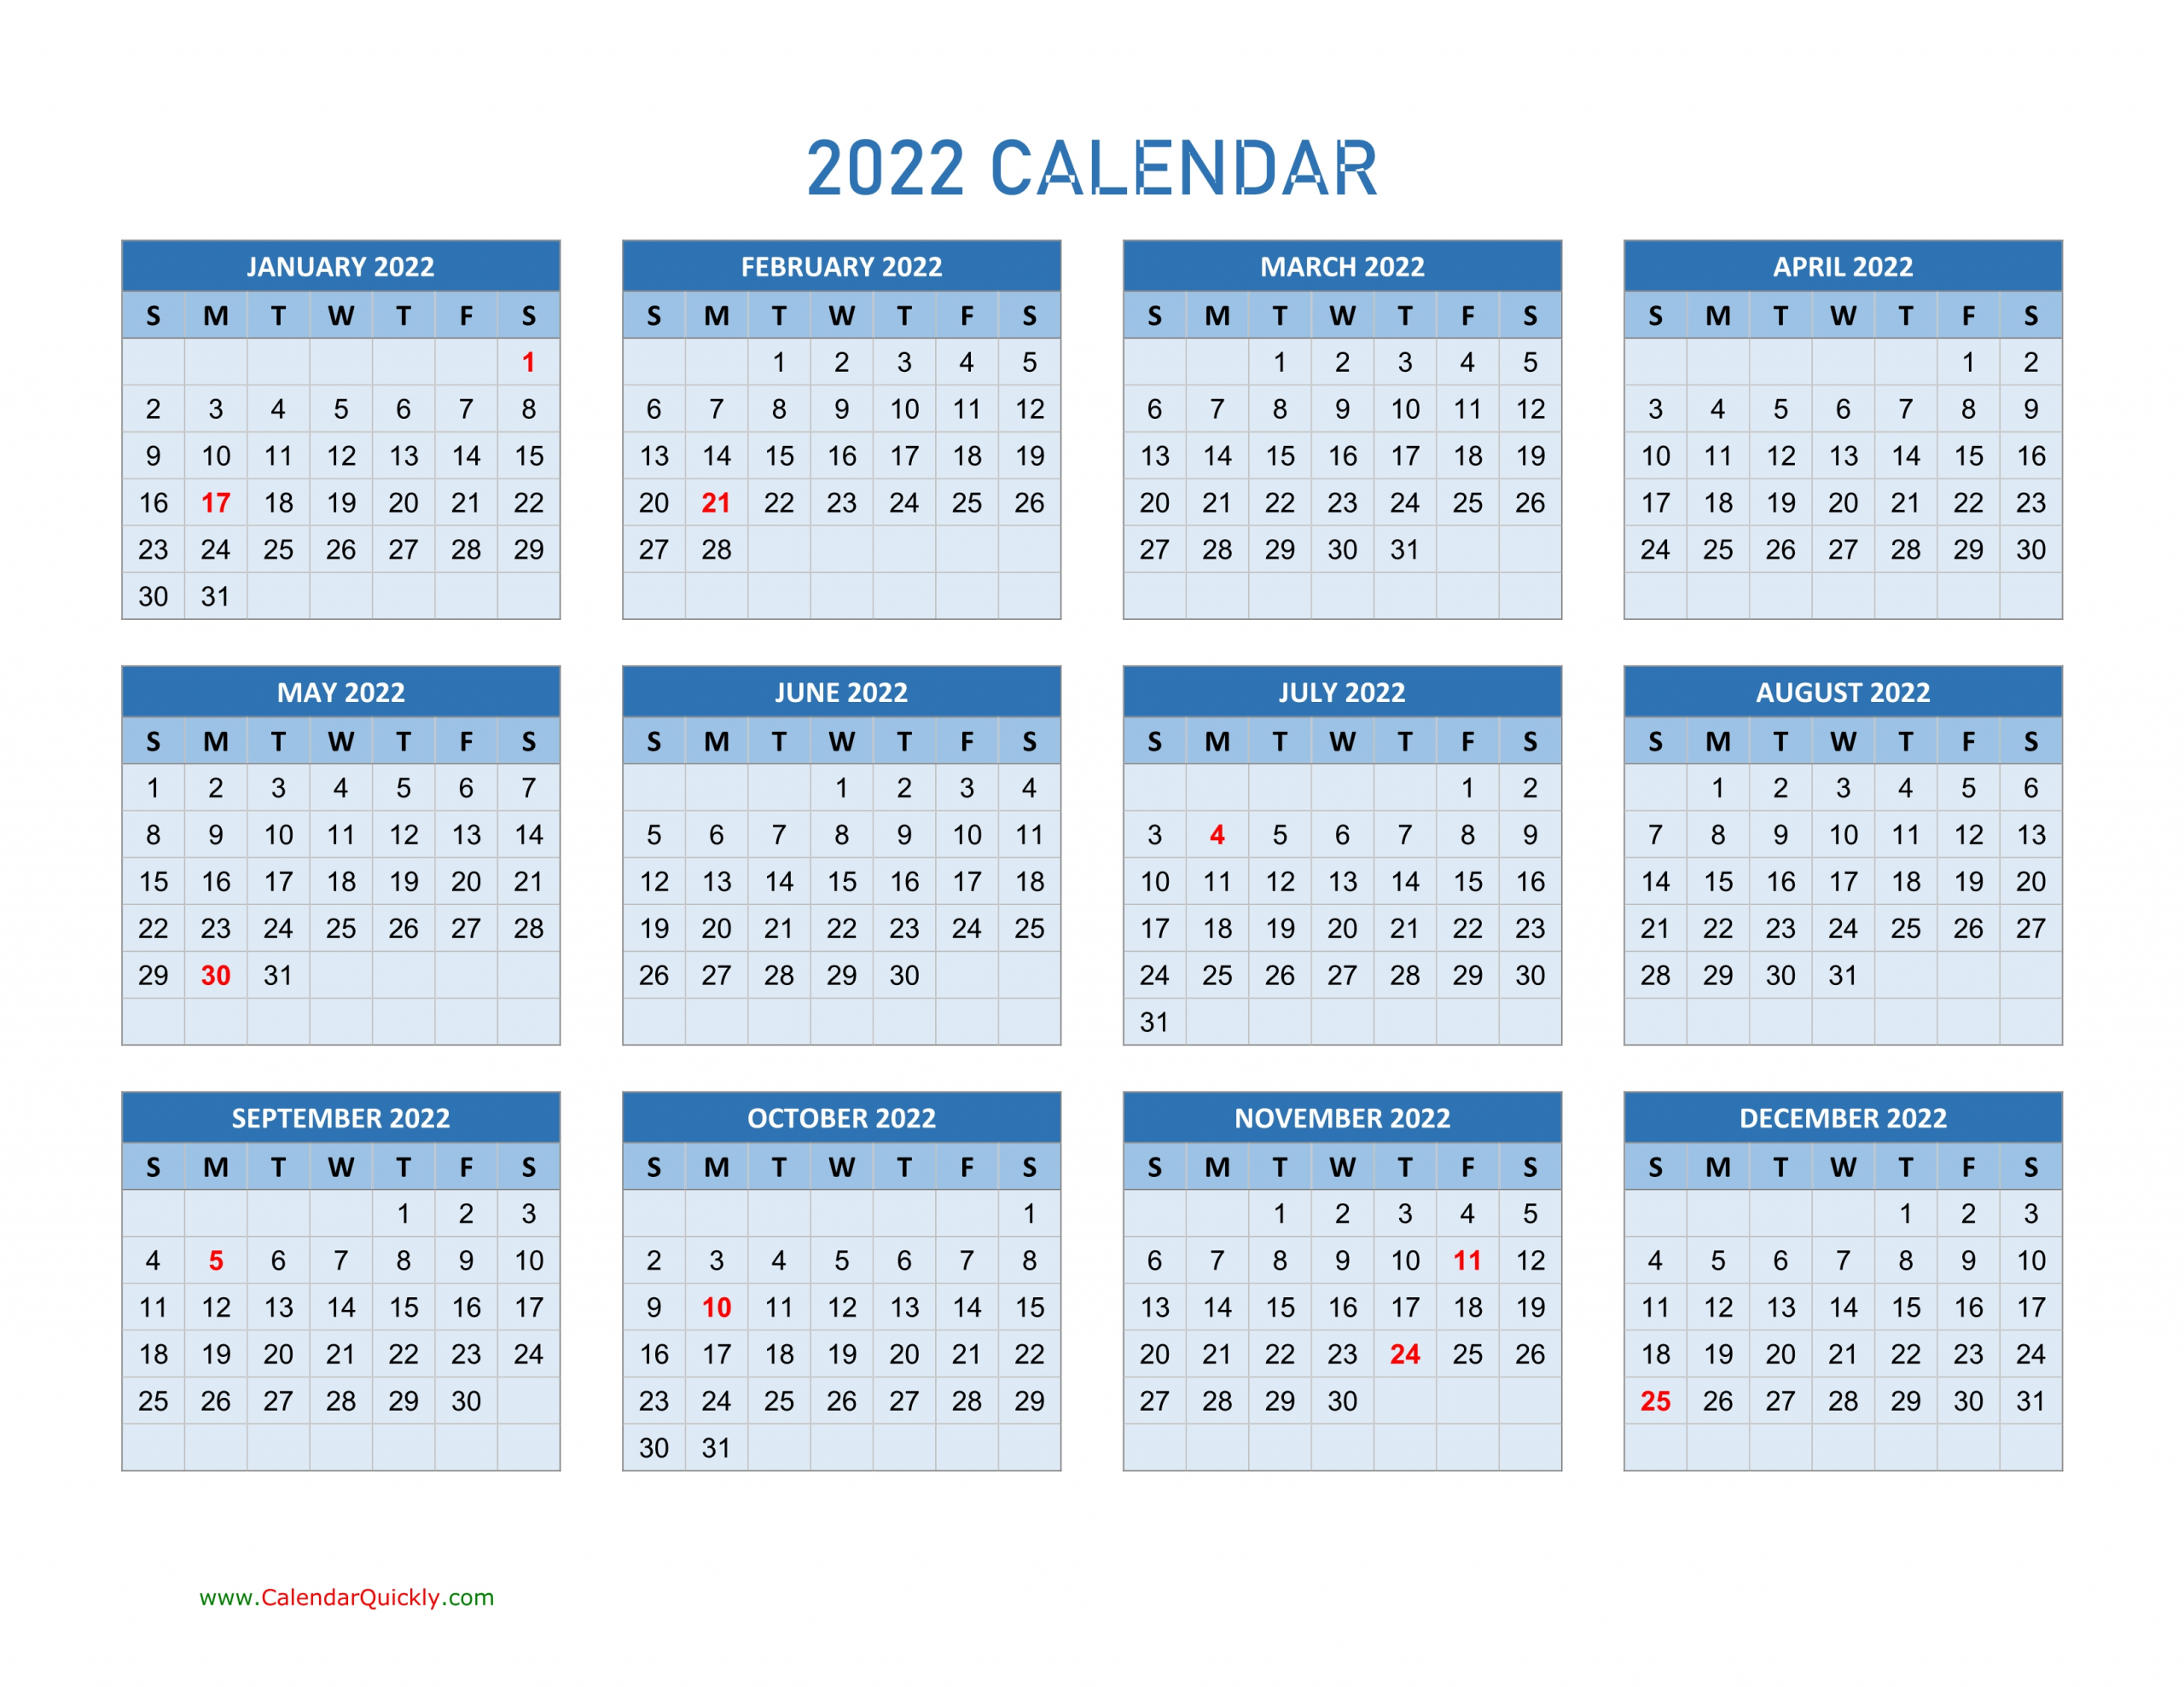 Year 2022 Calendars | Calendar Quickly